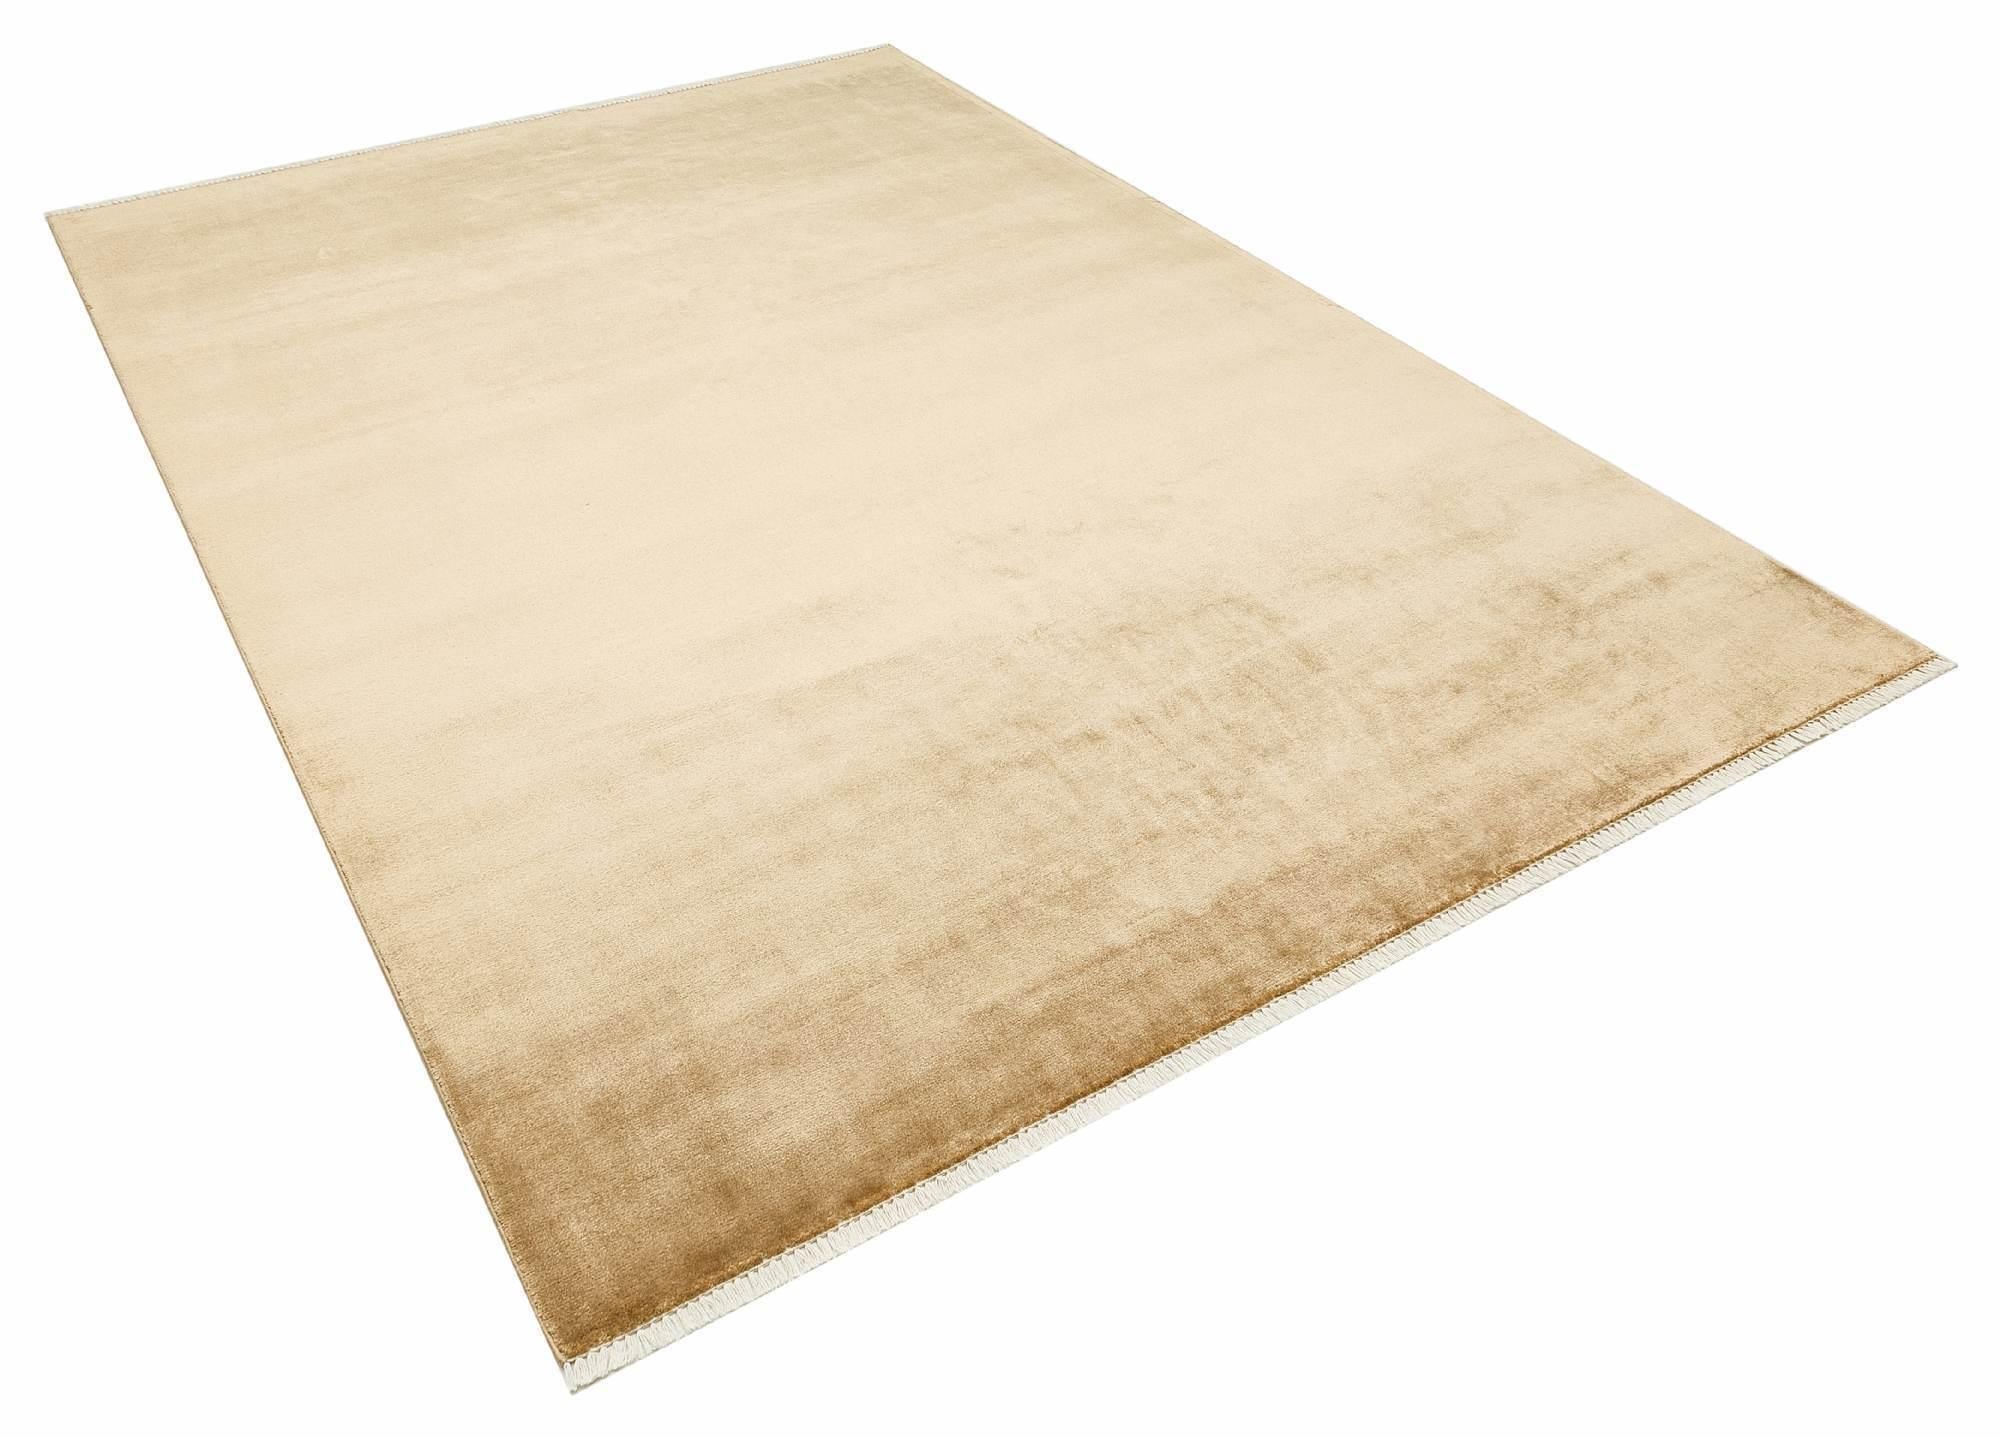 Apex Classy 4 'x 6' Wool Beige Area Rug